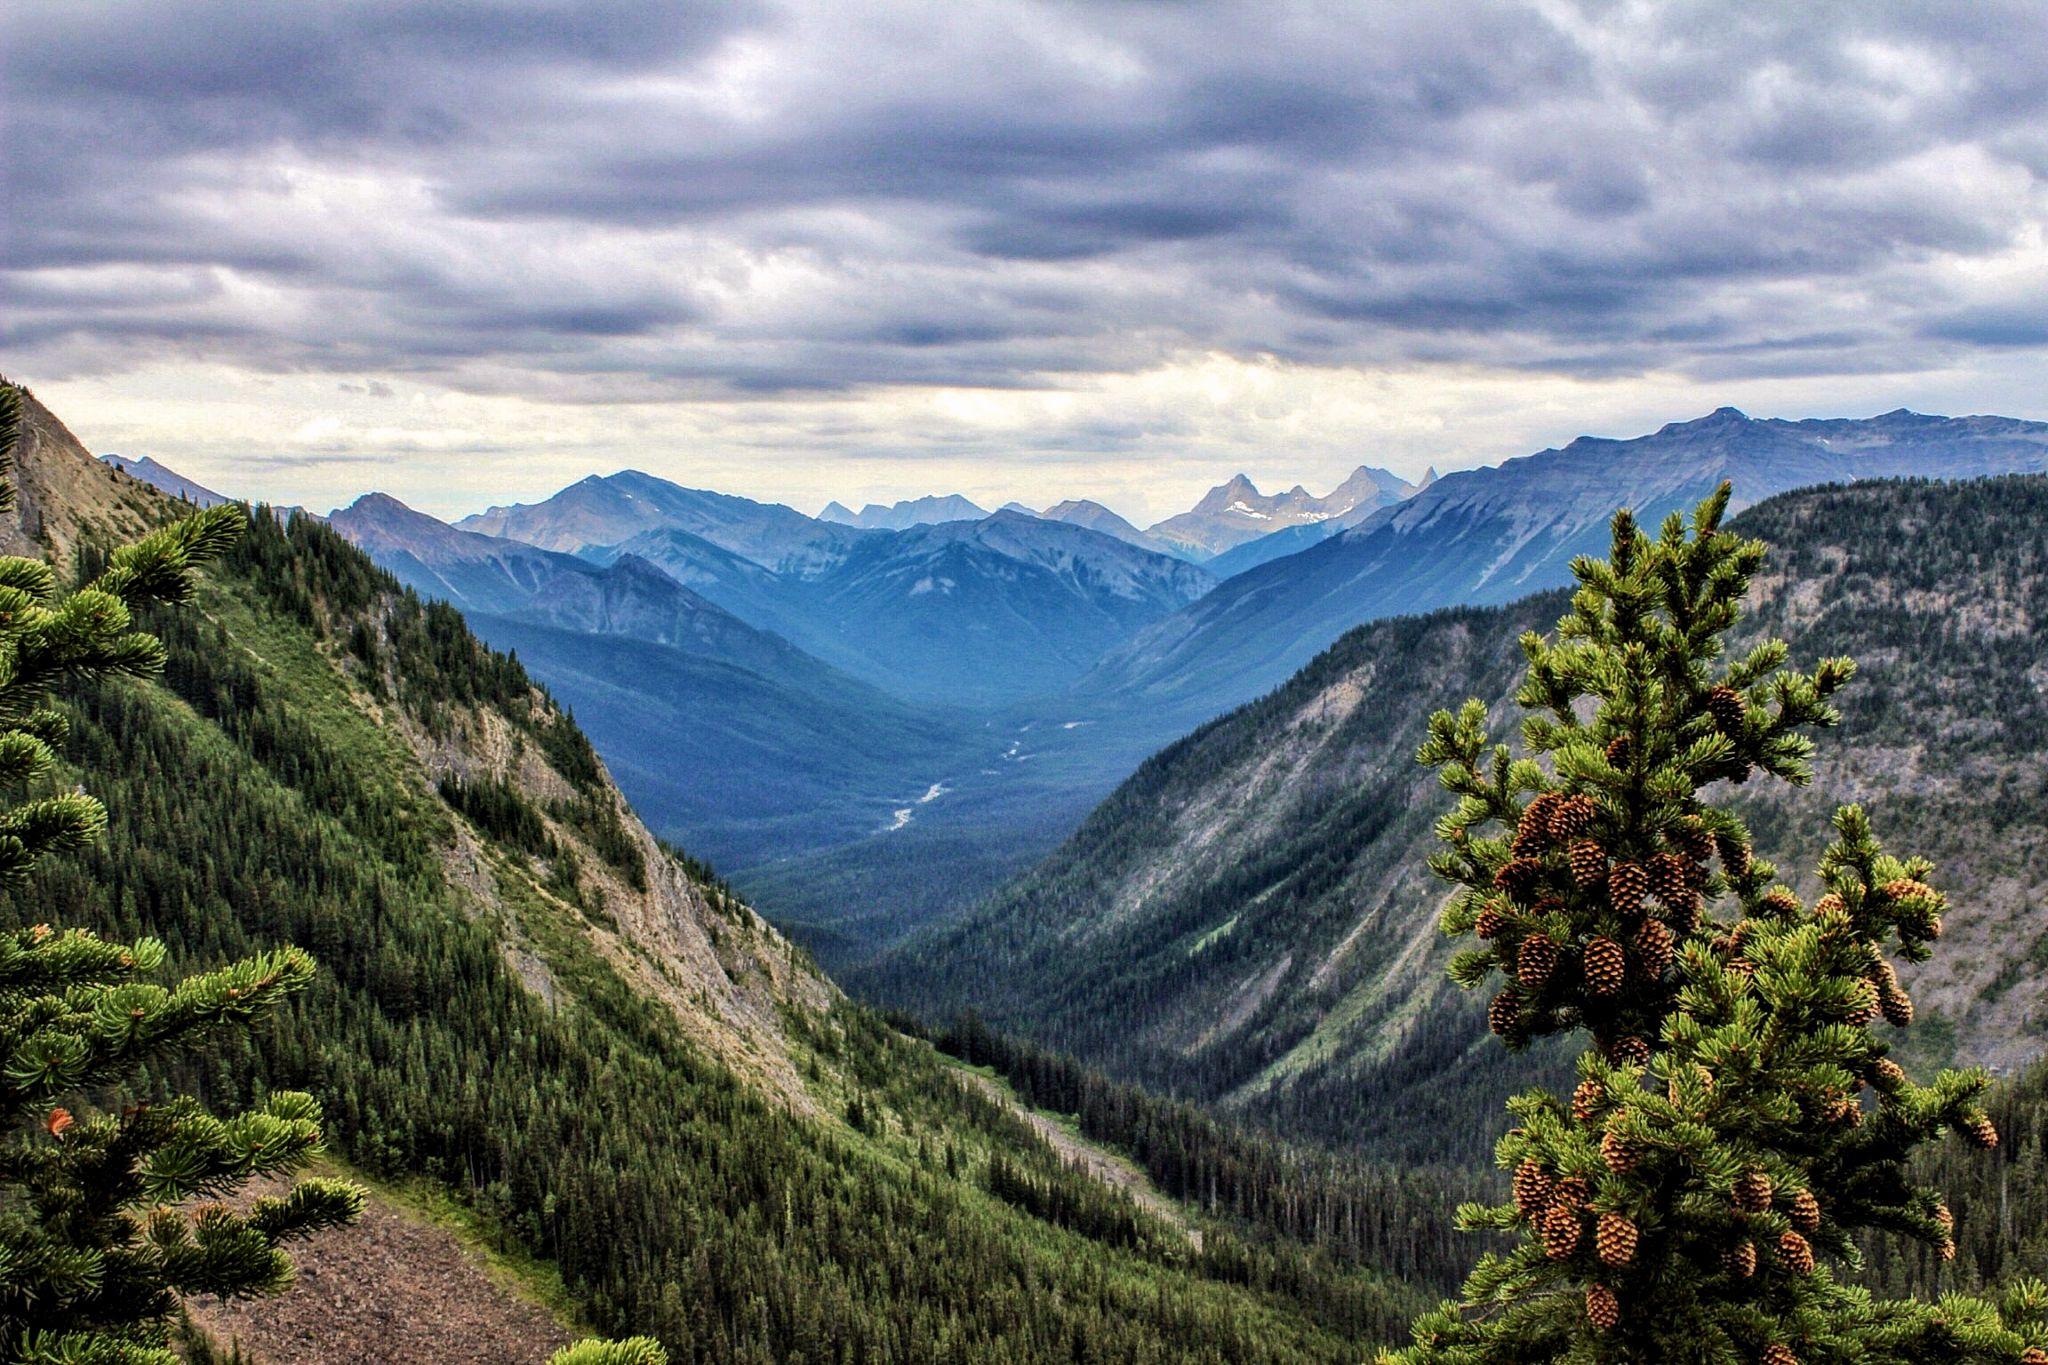 Simpson Viewpoint, Canada